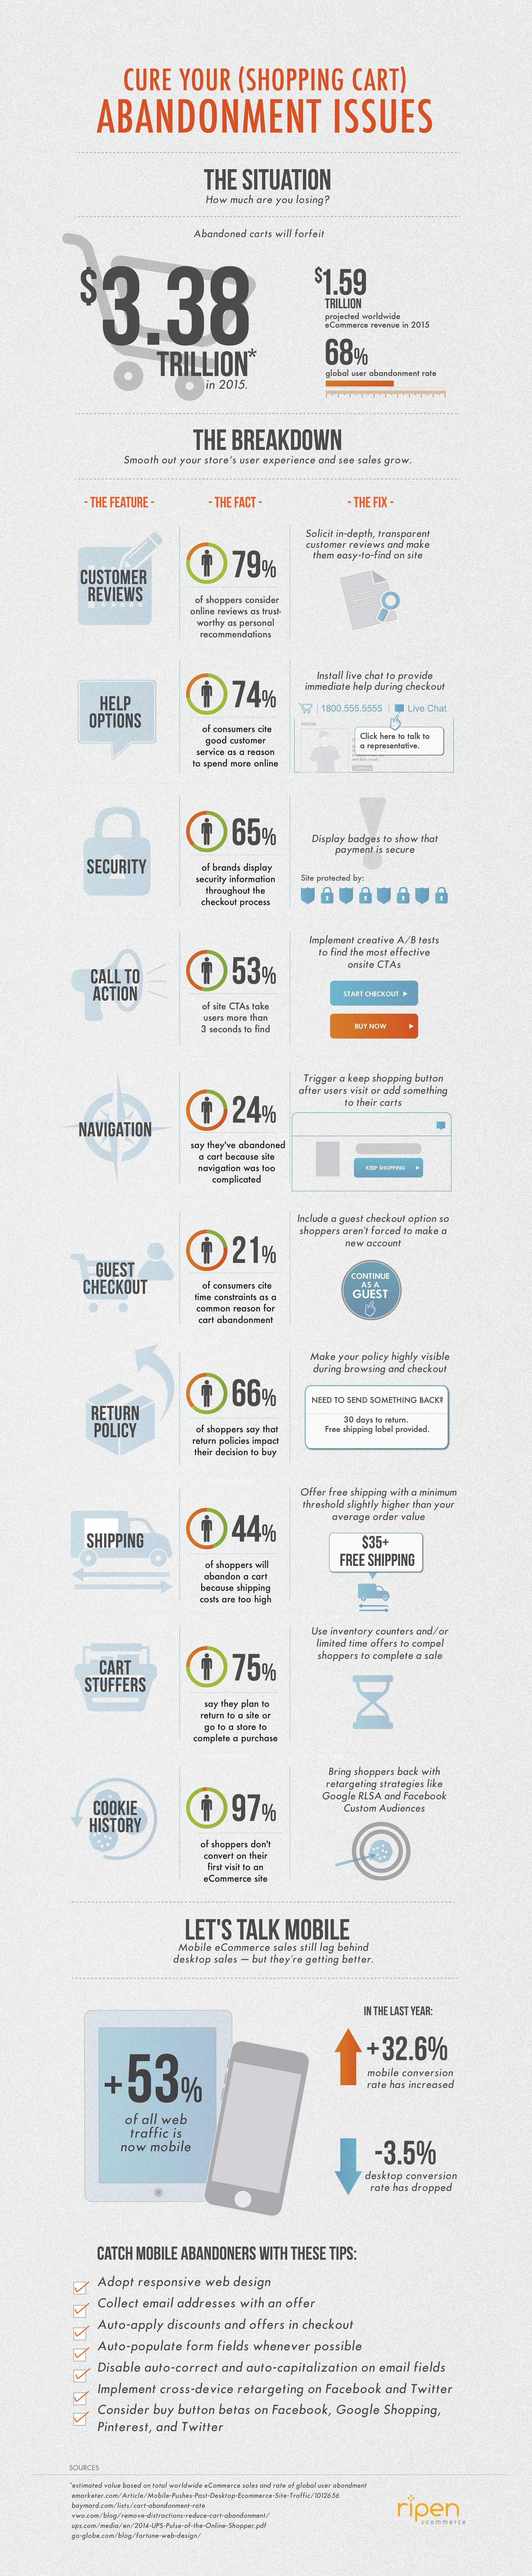 Cart Abandoment Infographic